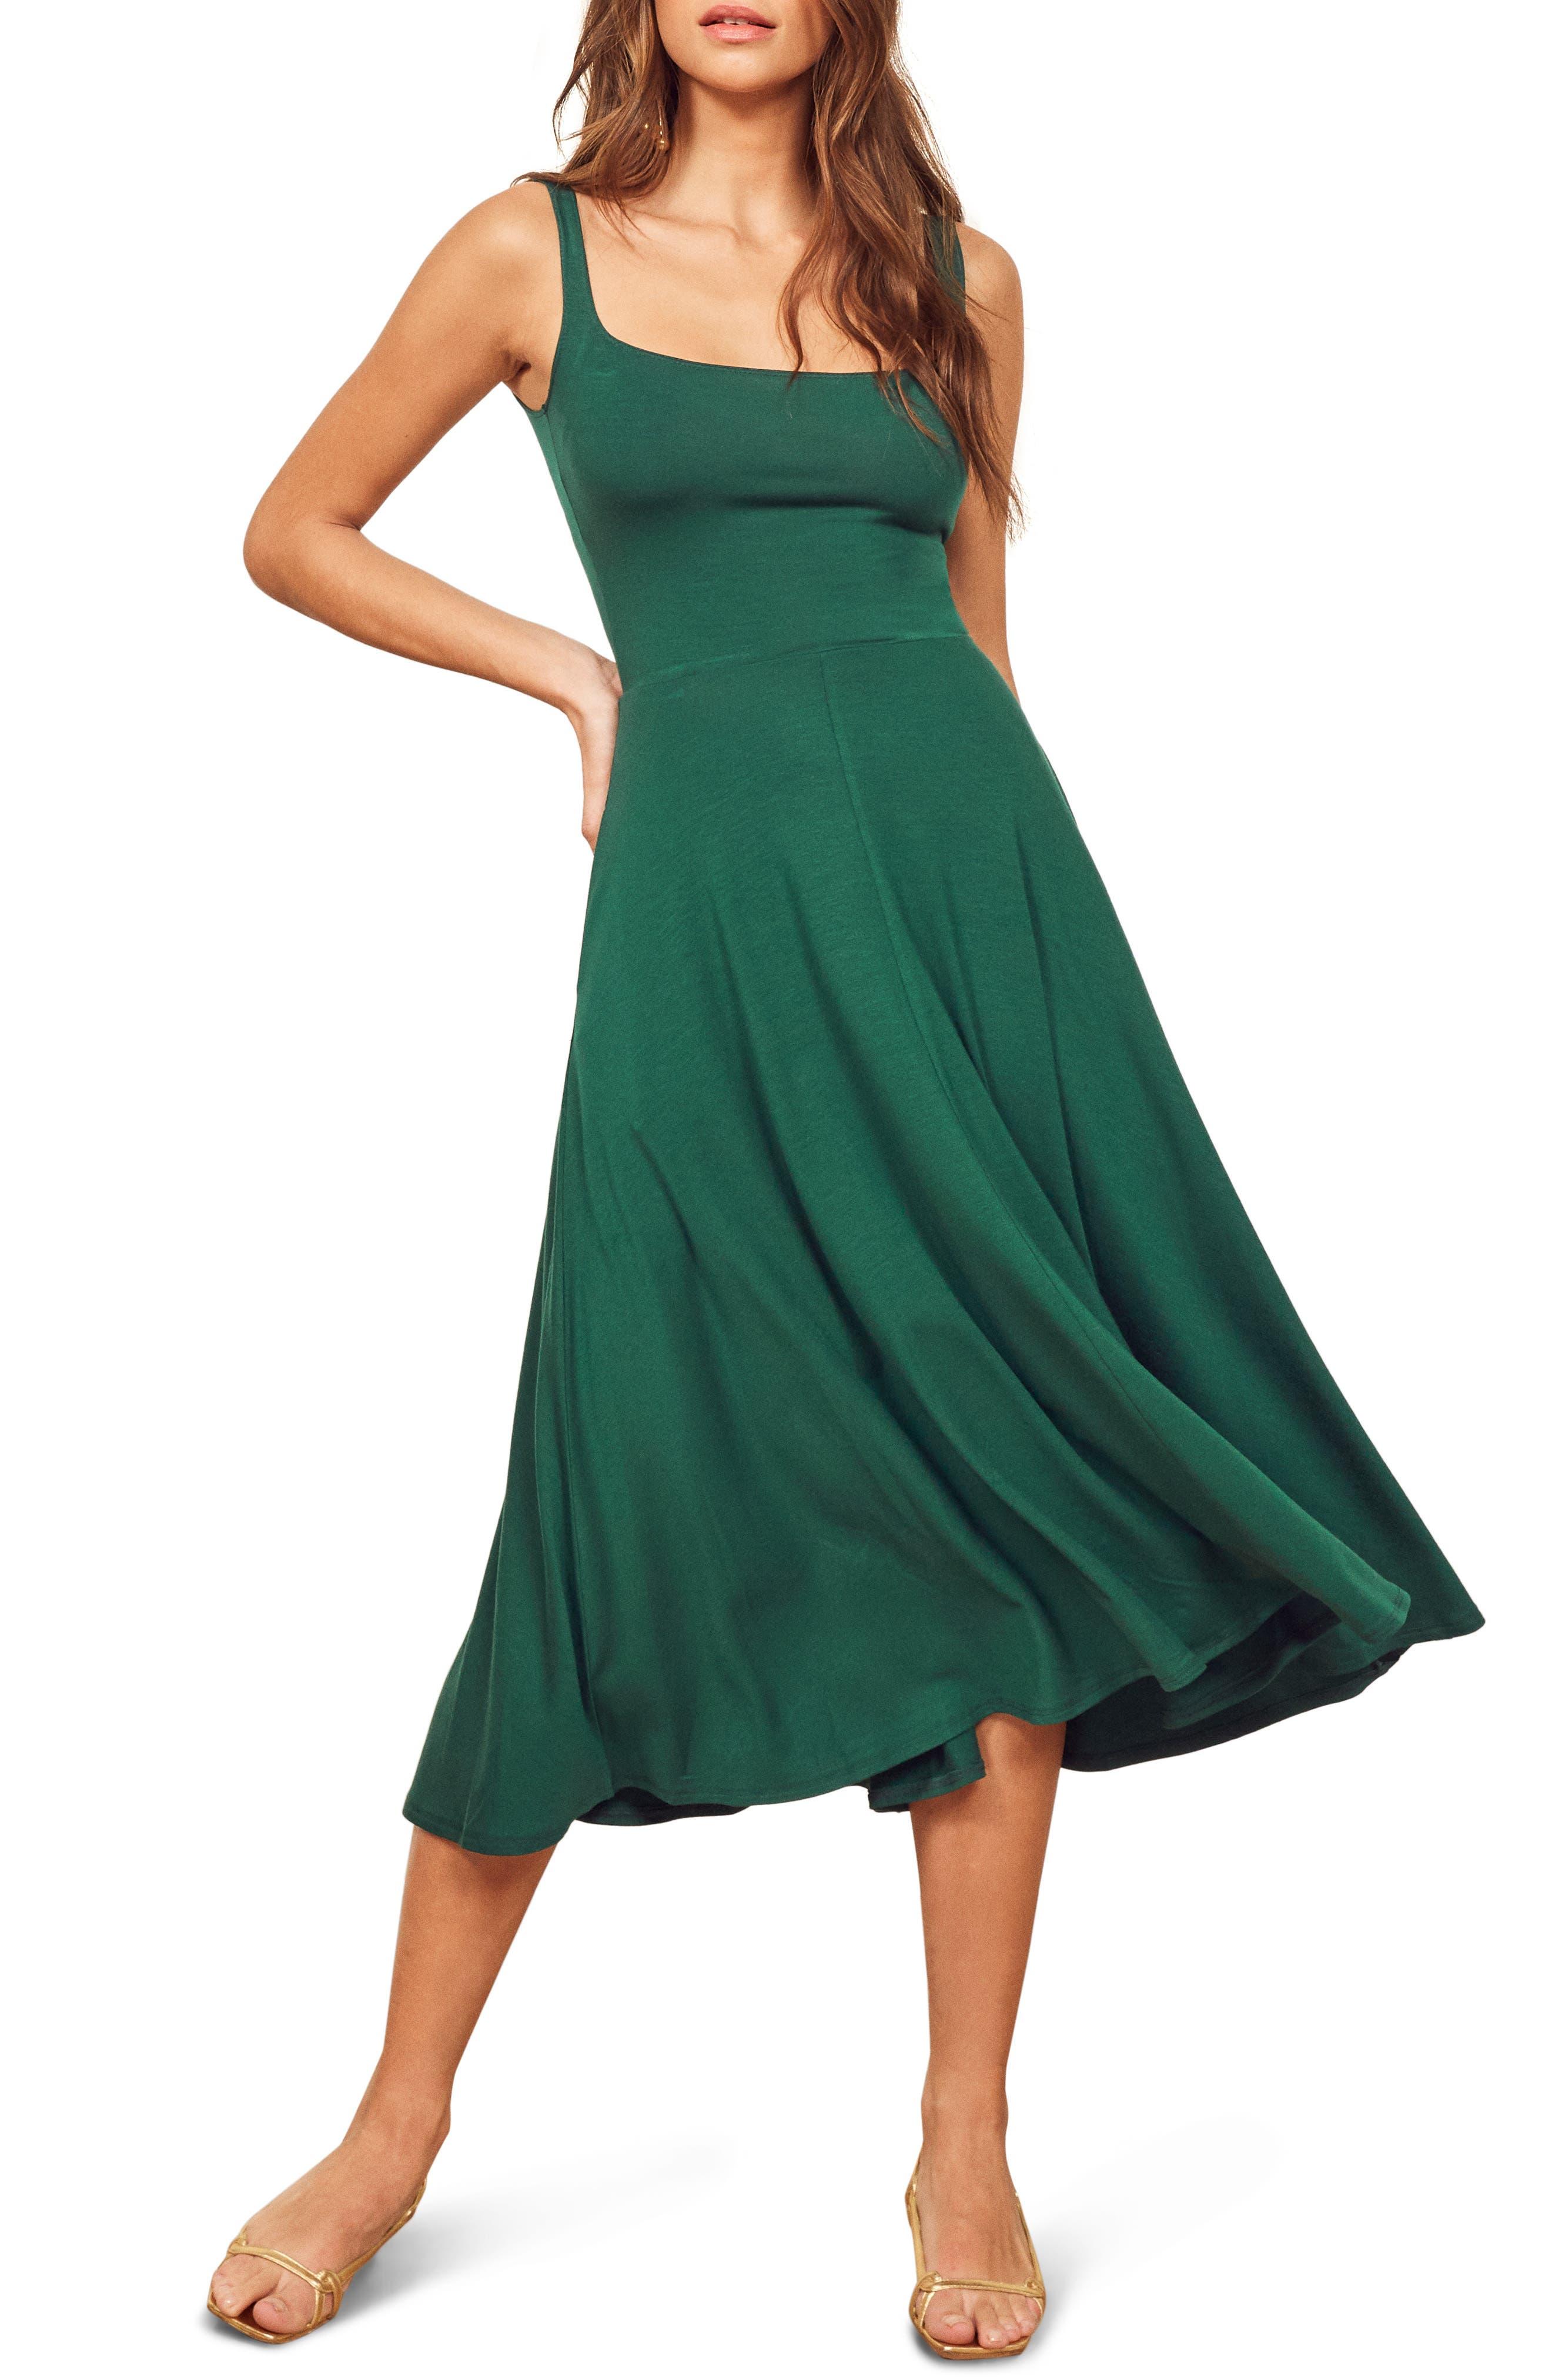 Reformation Mary Tank Dress, Green